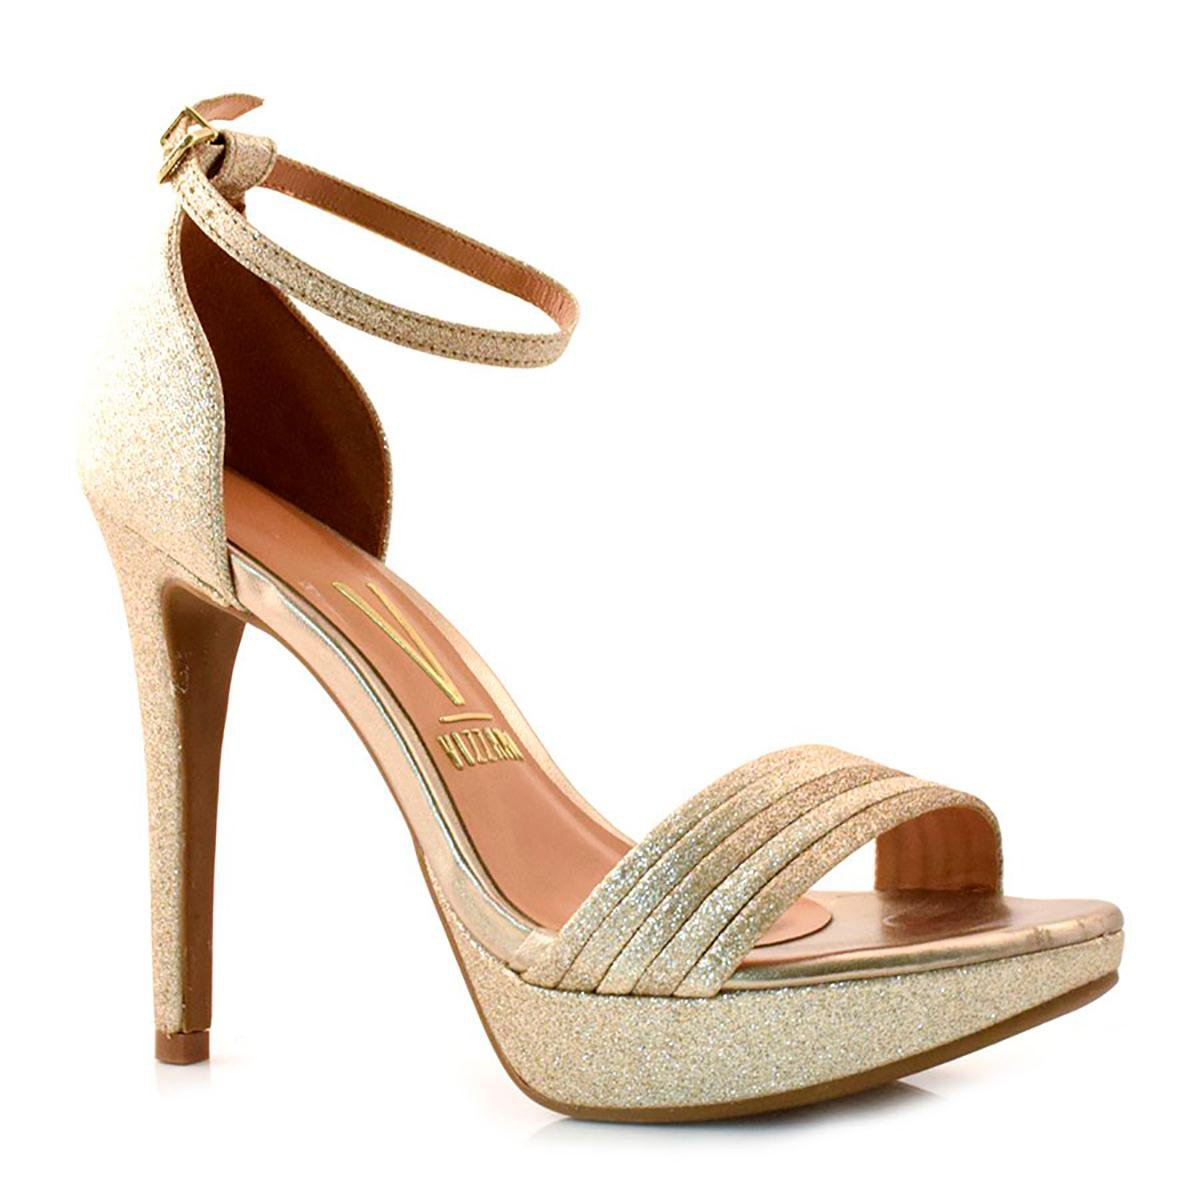 Sandália Social Vizzano Gliter Feminina - Dourado - Compre Agora ... 2da35e71bfe12